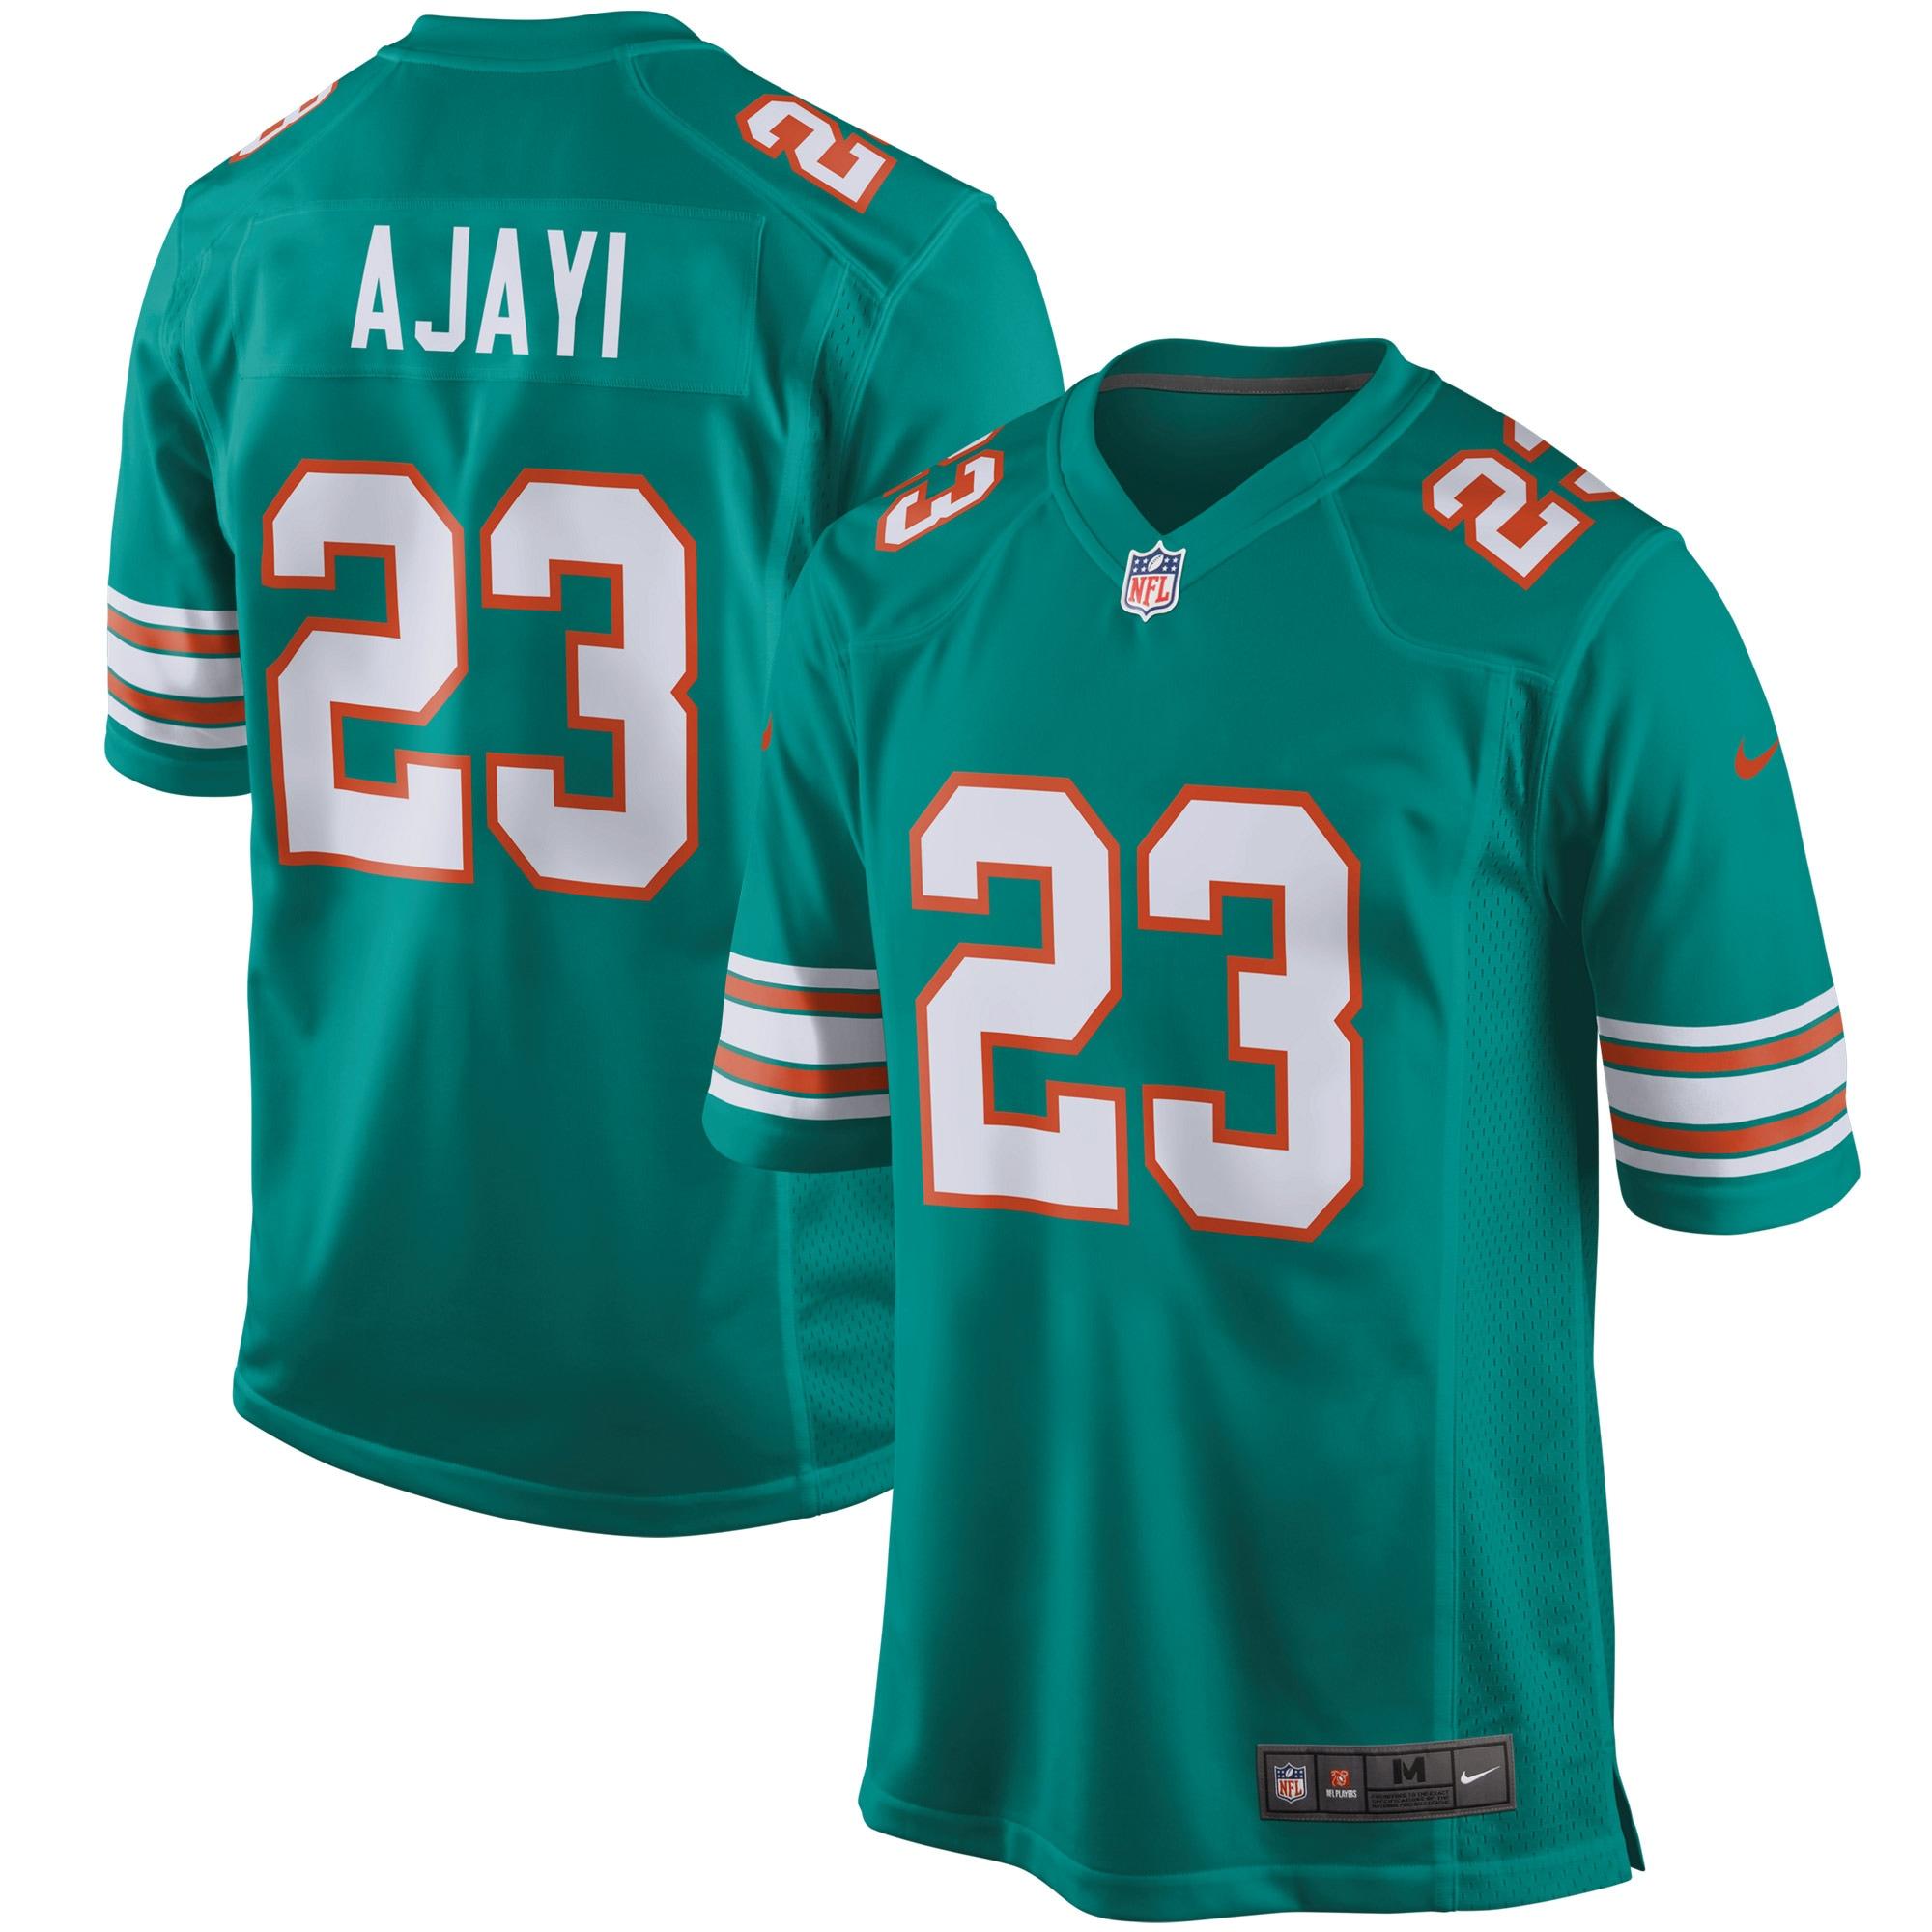 Jay Ajayi Miami Dolphins Nike Throwback Game Jersey - Aqua